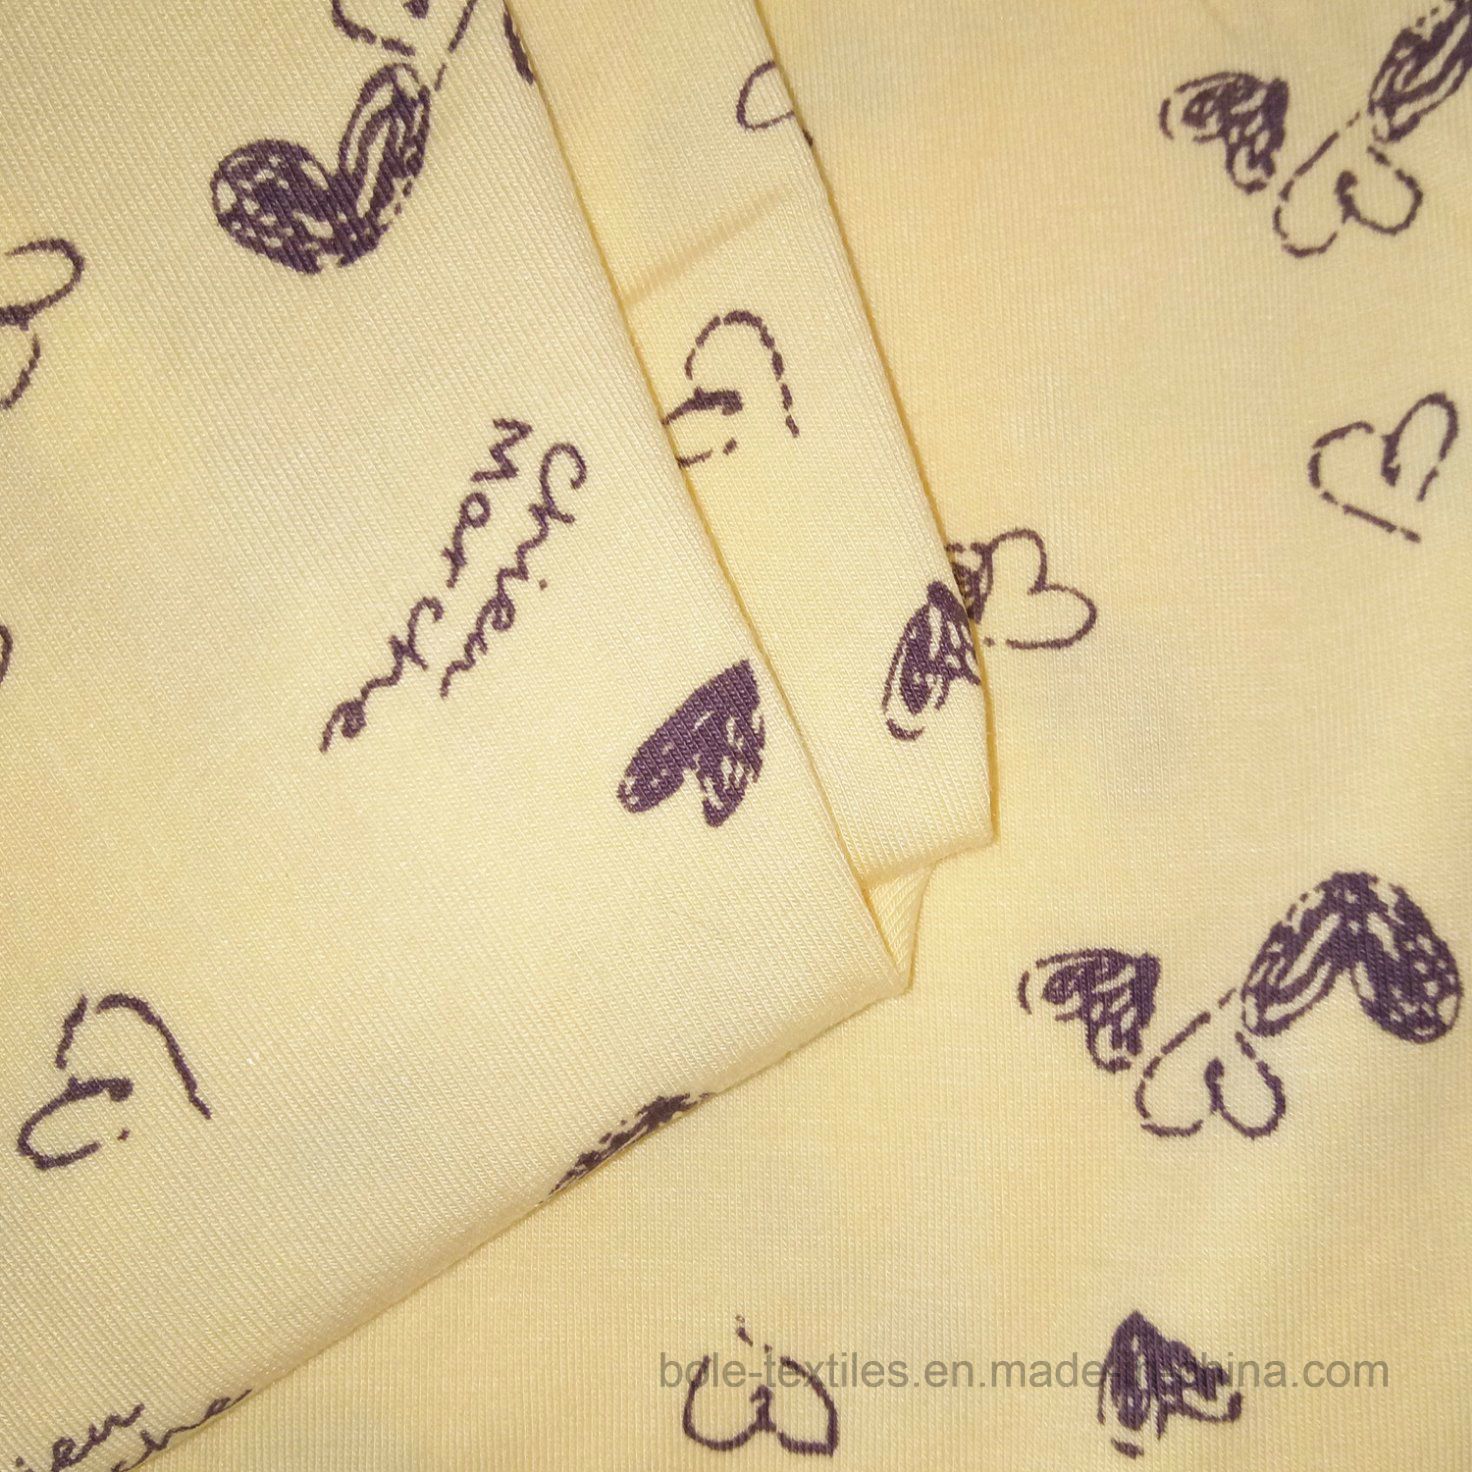 Cotton Fabric/Cotton/Spandex Single Jersey